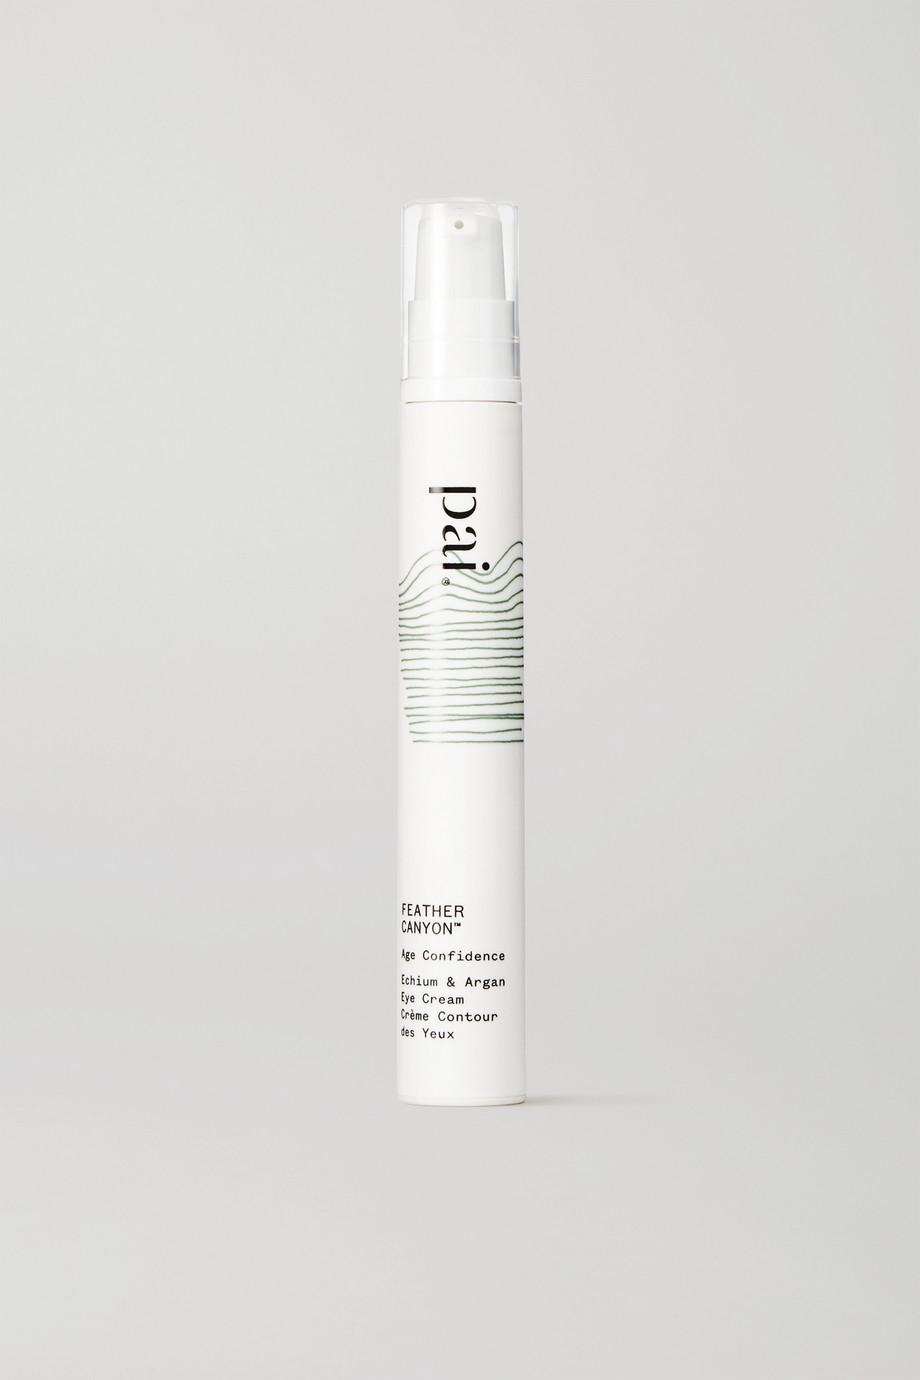 Pai Skincare + NET SUSTAIN Echium & Argan Gentle Eye Cream, 15ml